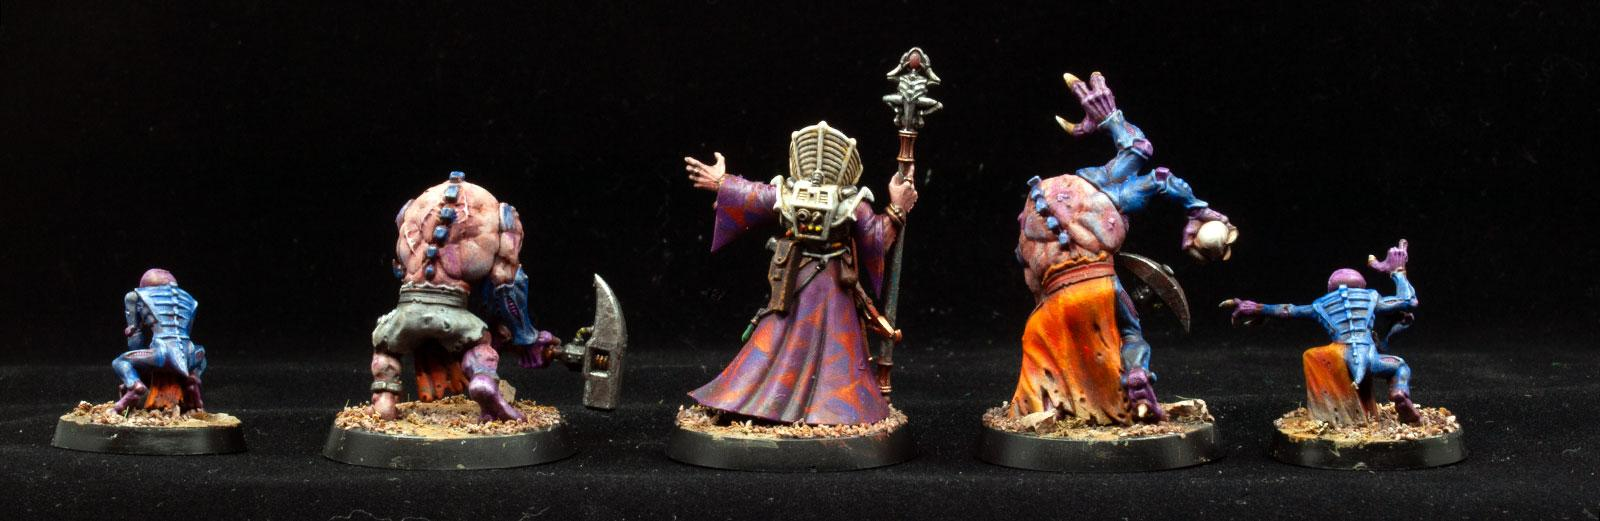 Aberrants, Familiars, Genestealer Cults, Magus, Overkill